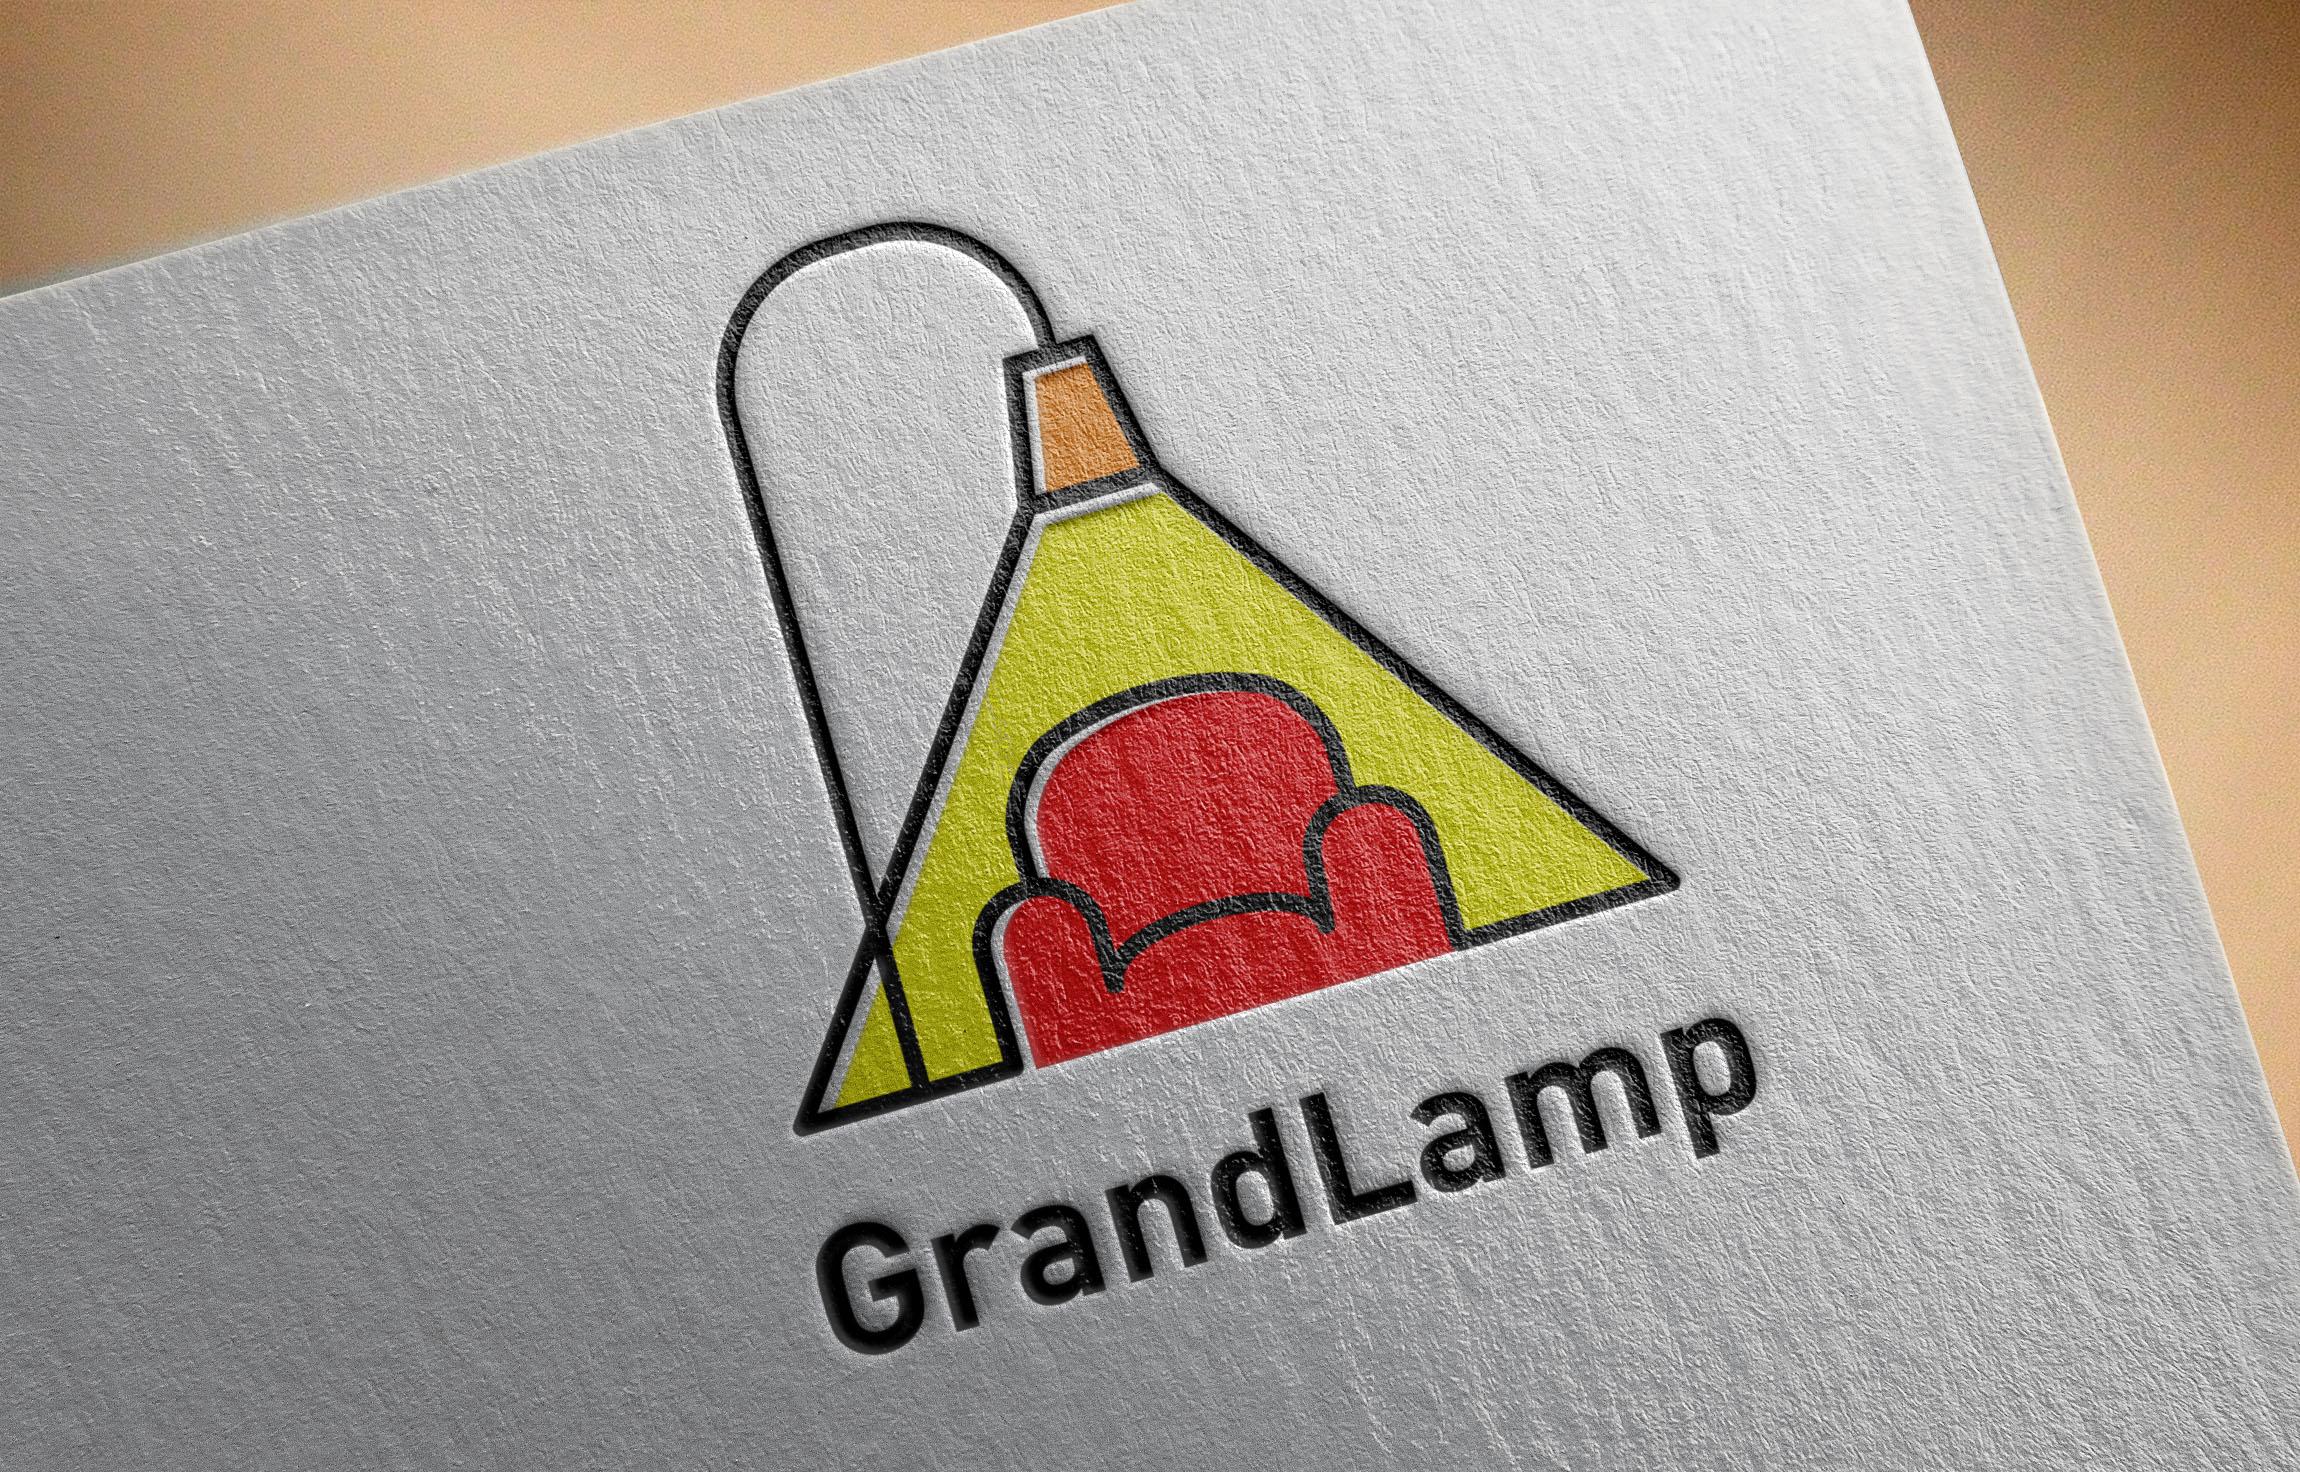 Разработка логотипа и элементов фирменного стиля фото f_38757df0780441a5.jpg